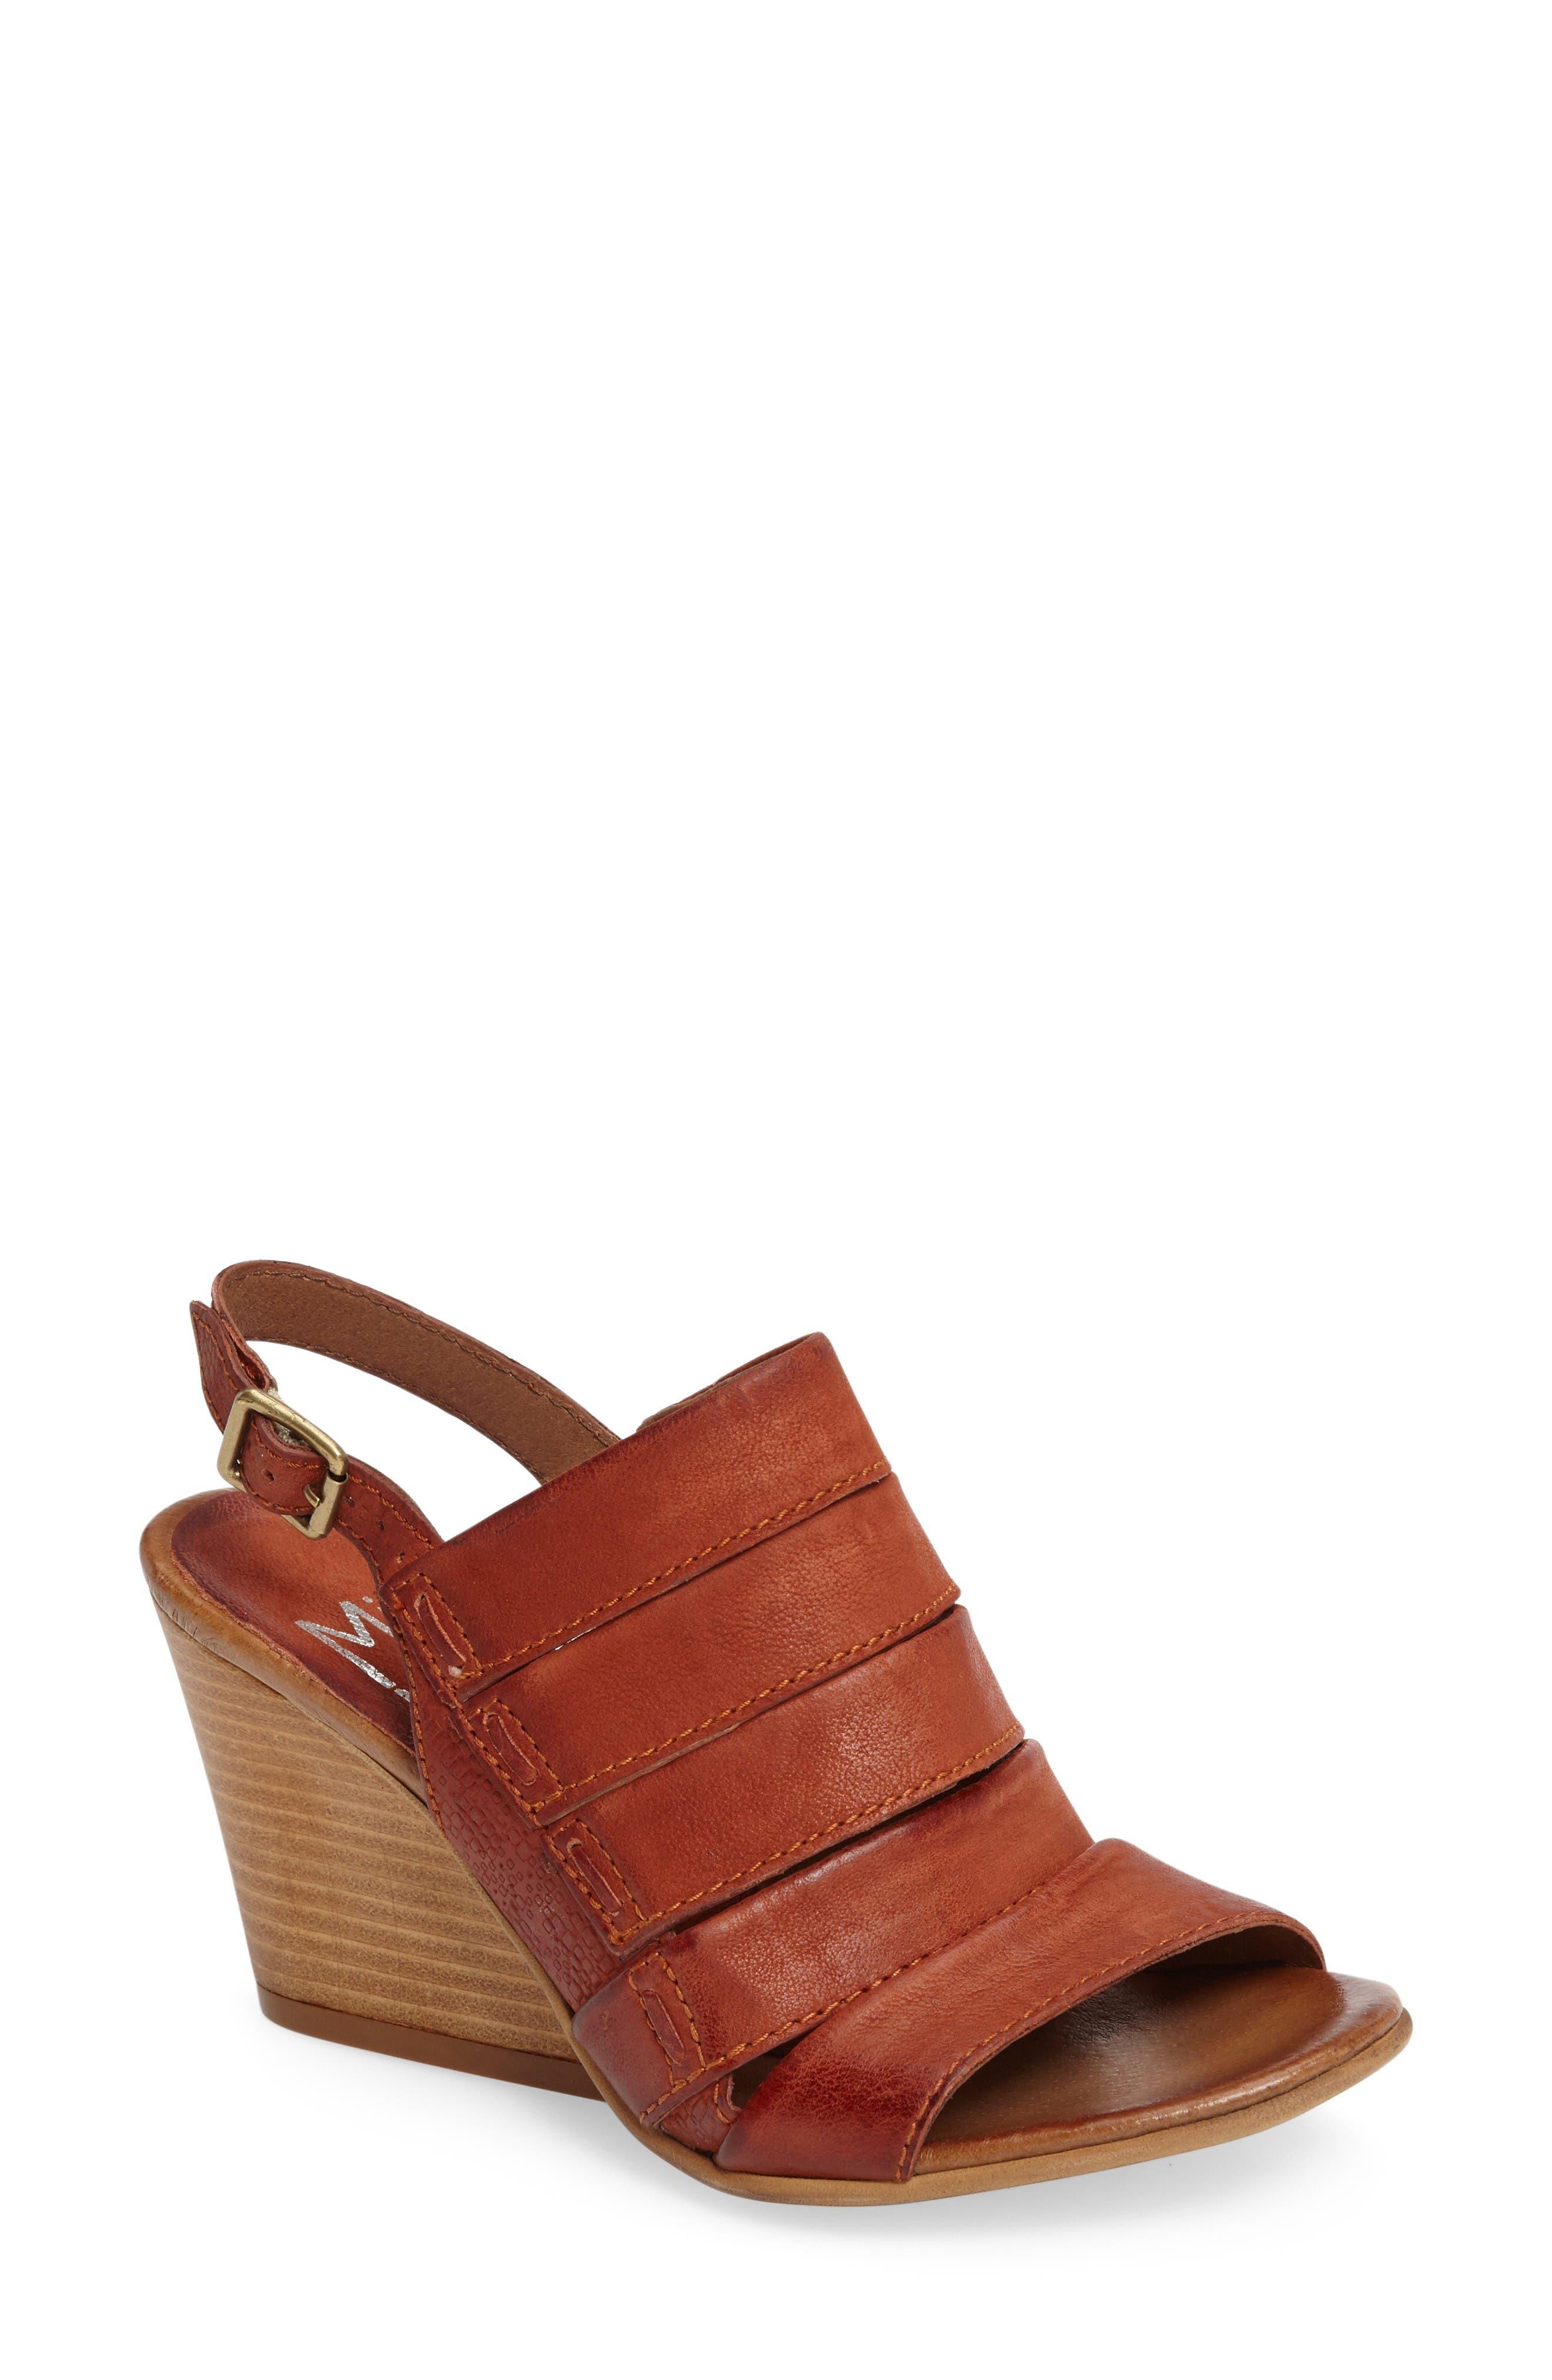 Main Image - Miz Mooz Kenmare Wedge Sandal (Women)